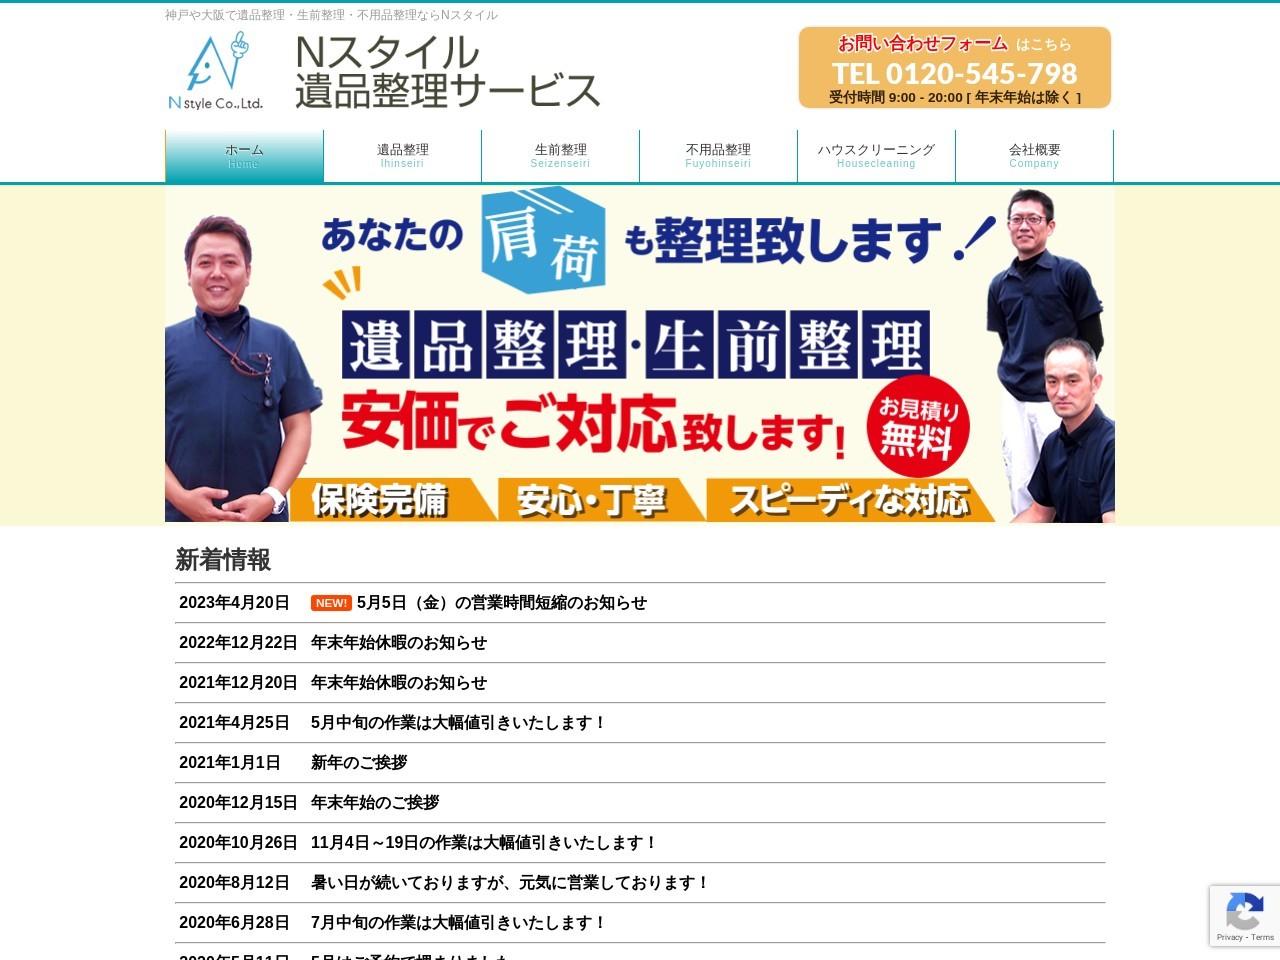 Nスタイル | 神戸や大阪でお引越し・遺品整理・不用品整理ならNスタイル